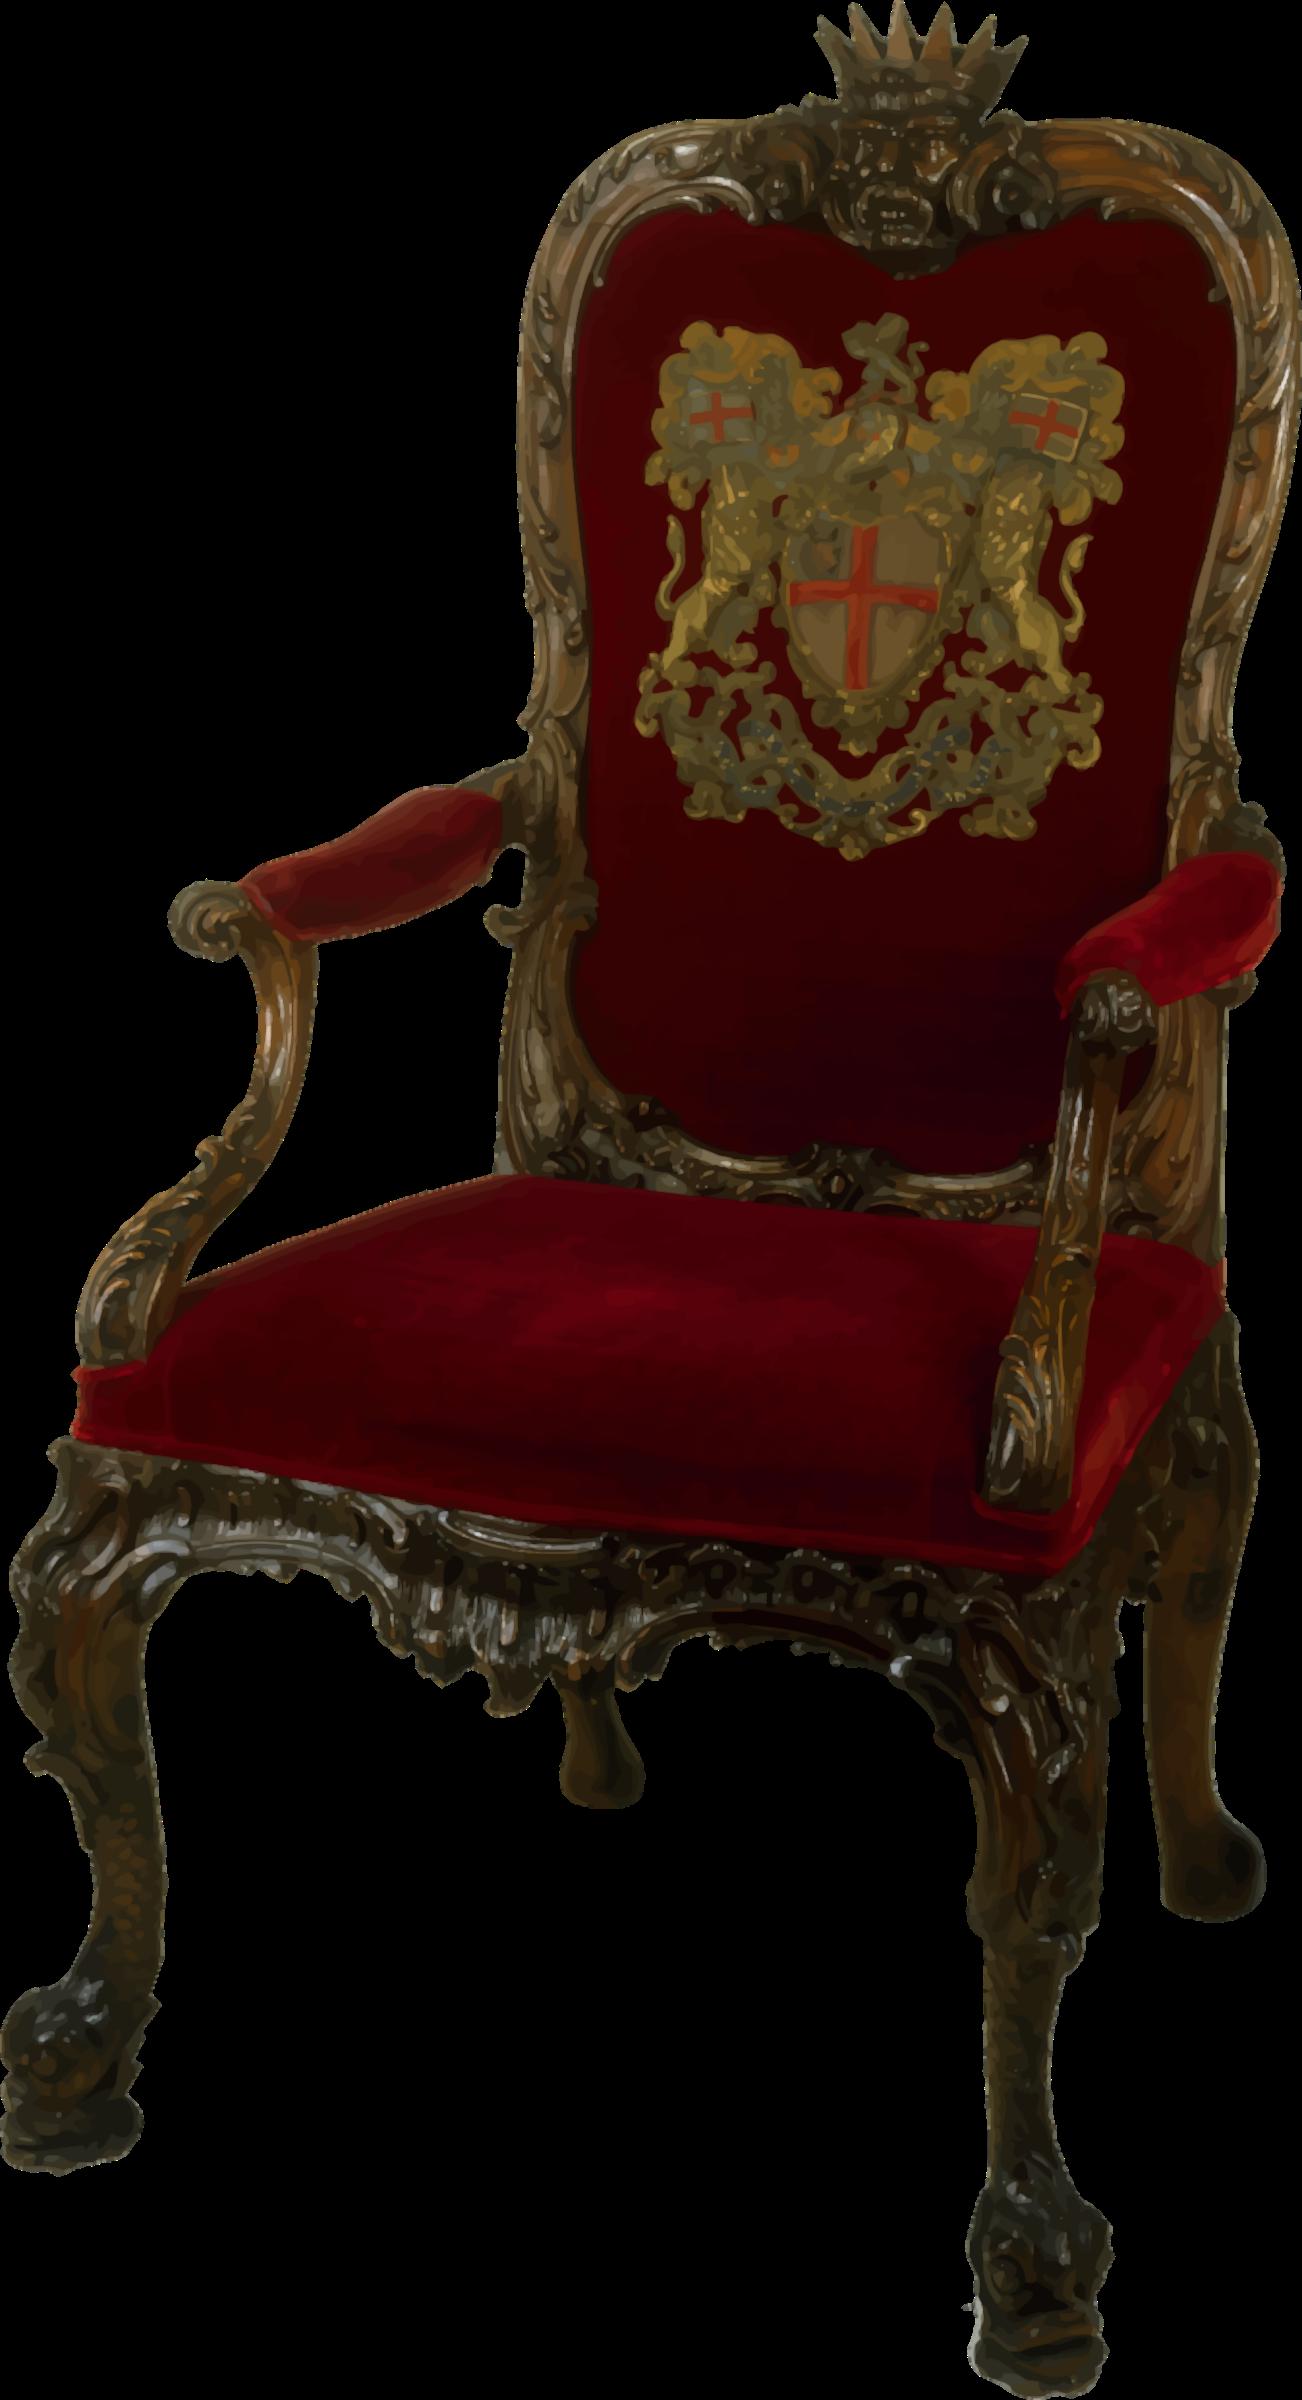 Ornate walnut big image. Clipart chair 3 chair